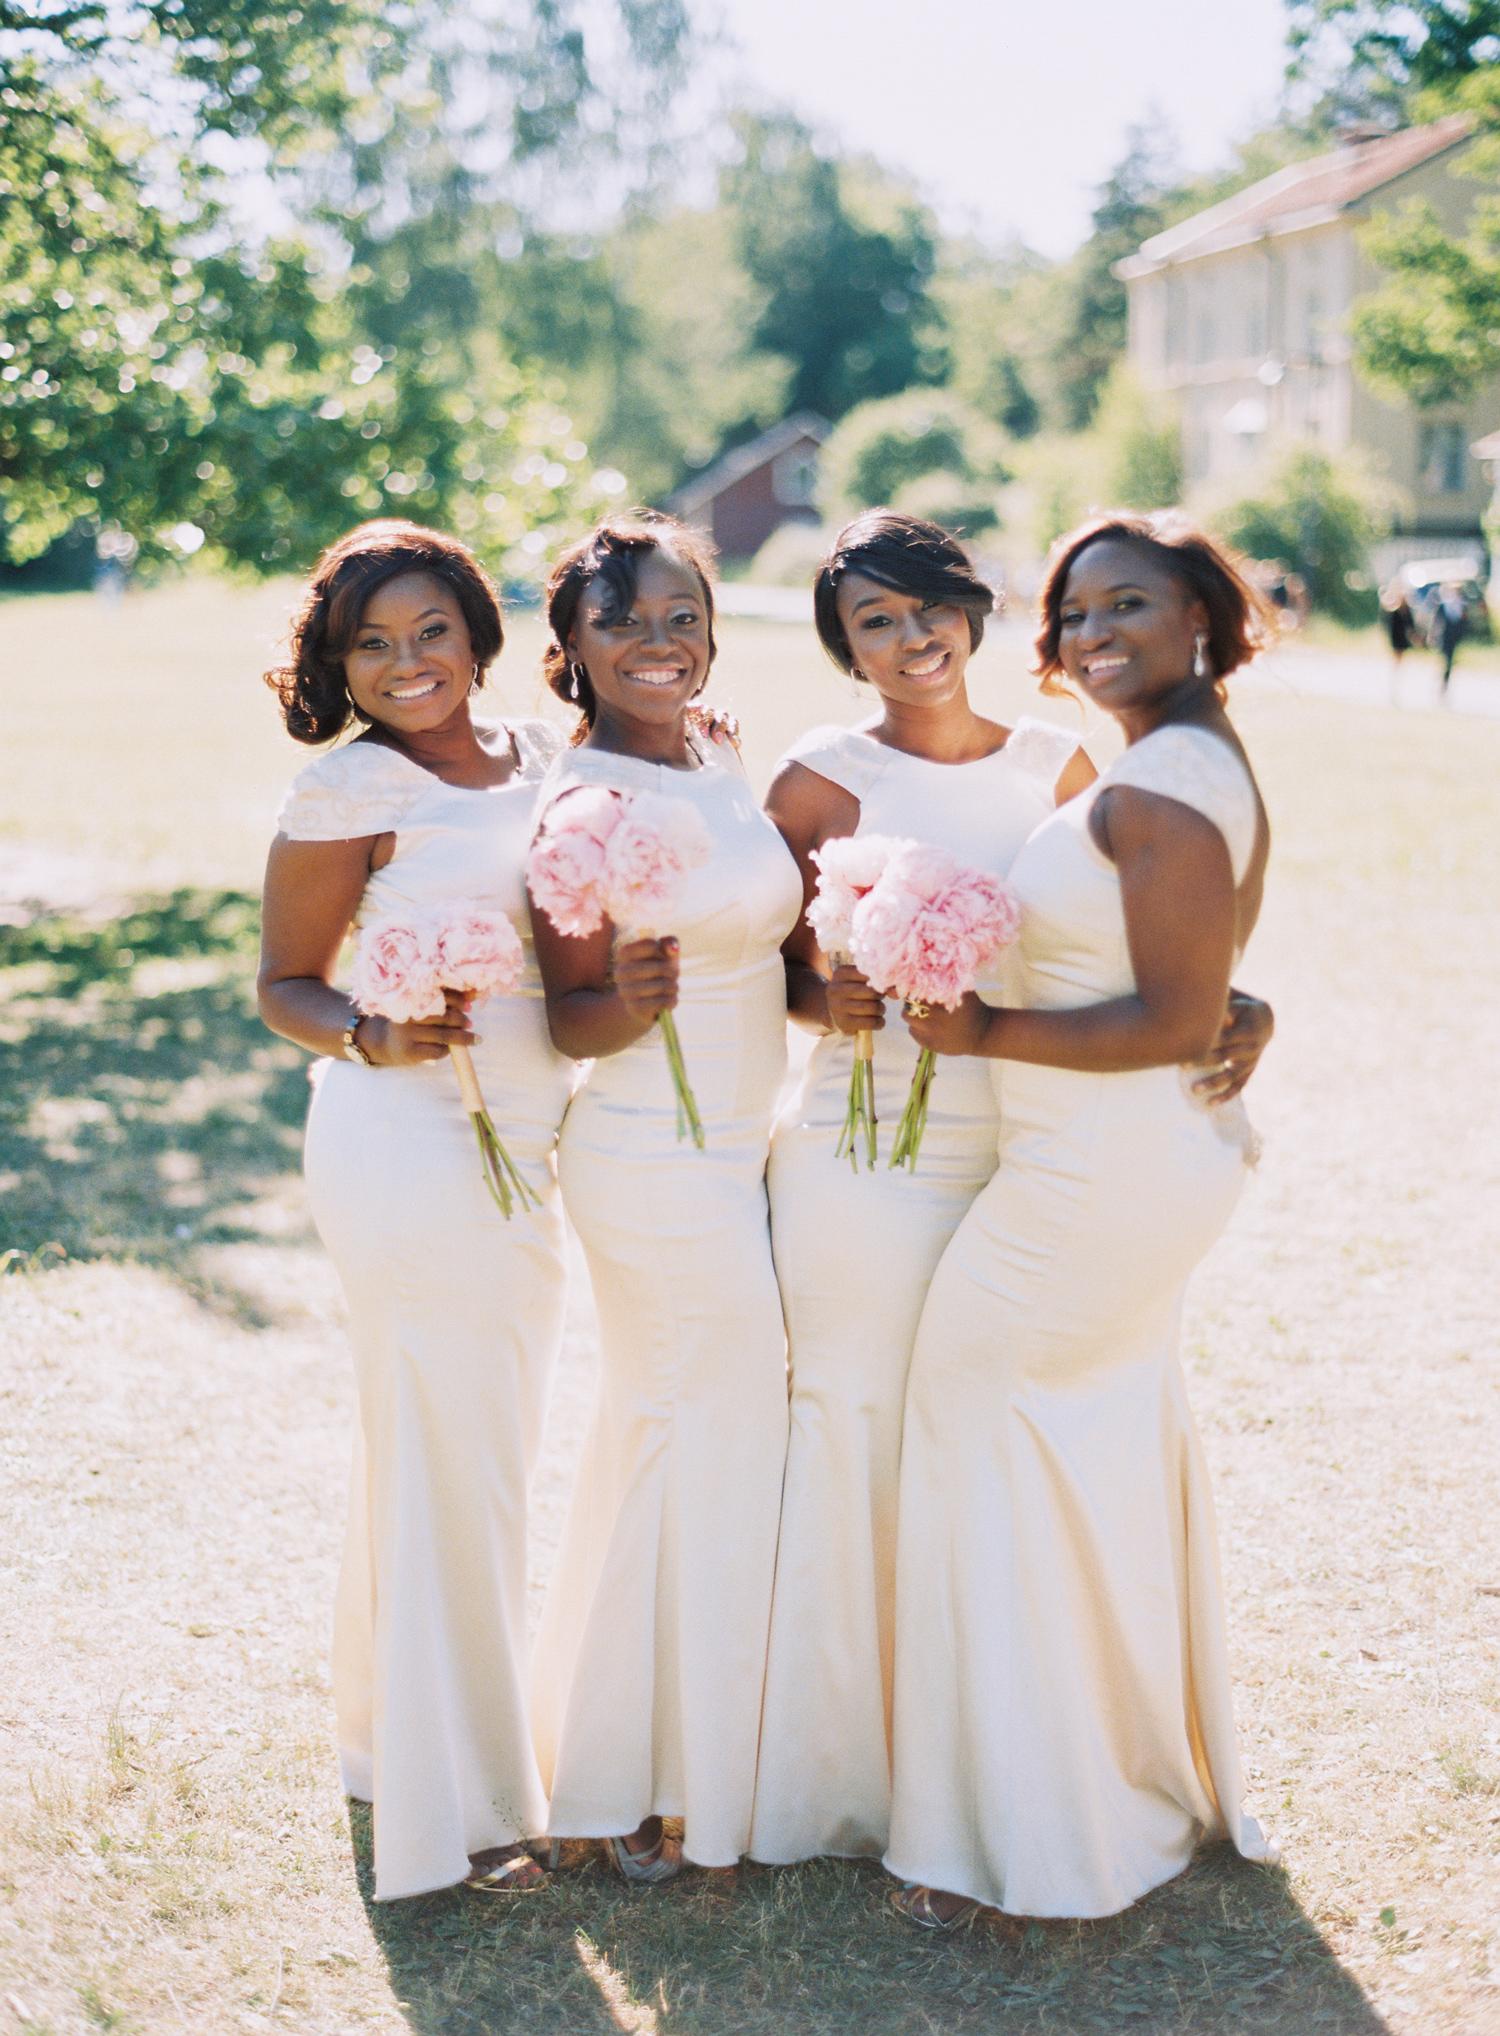 white bridesmaid dresses 2 brides photography